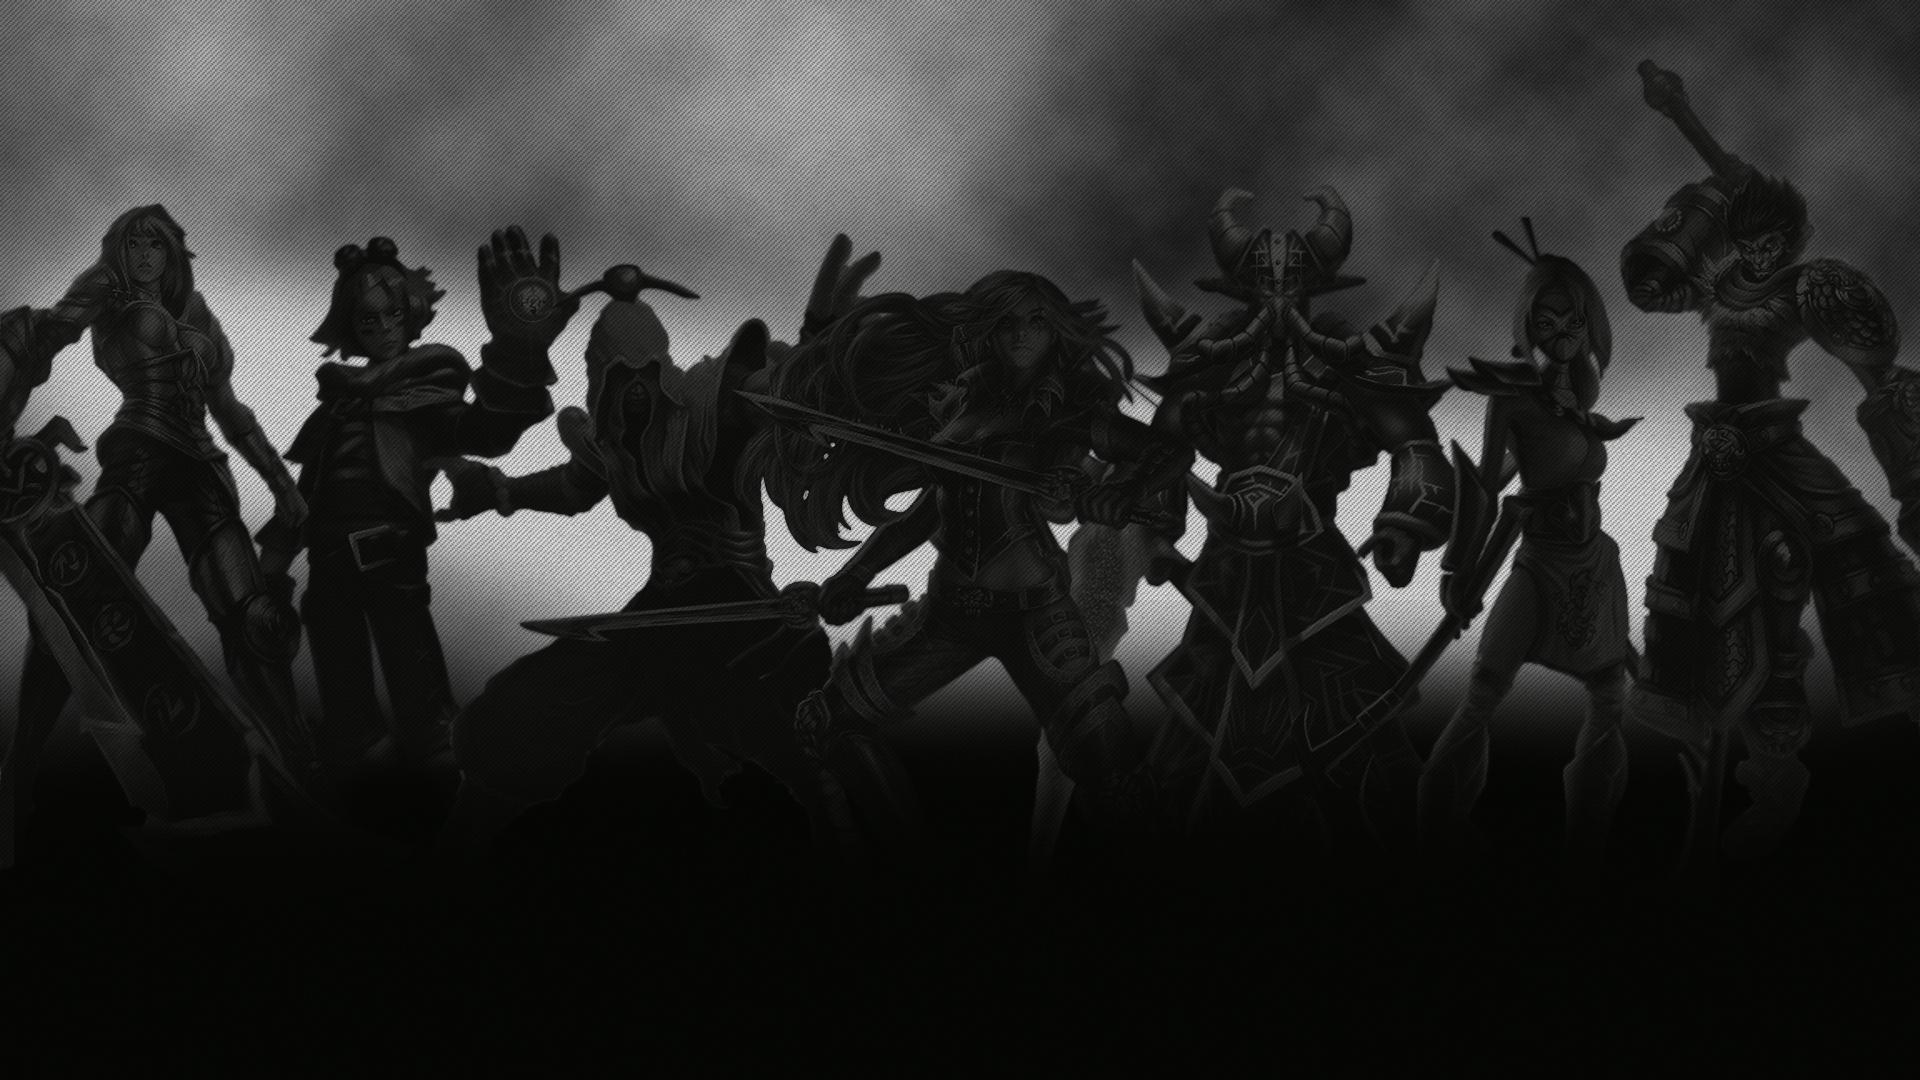 League of Legends wallpaper 169